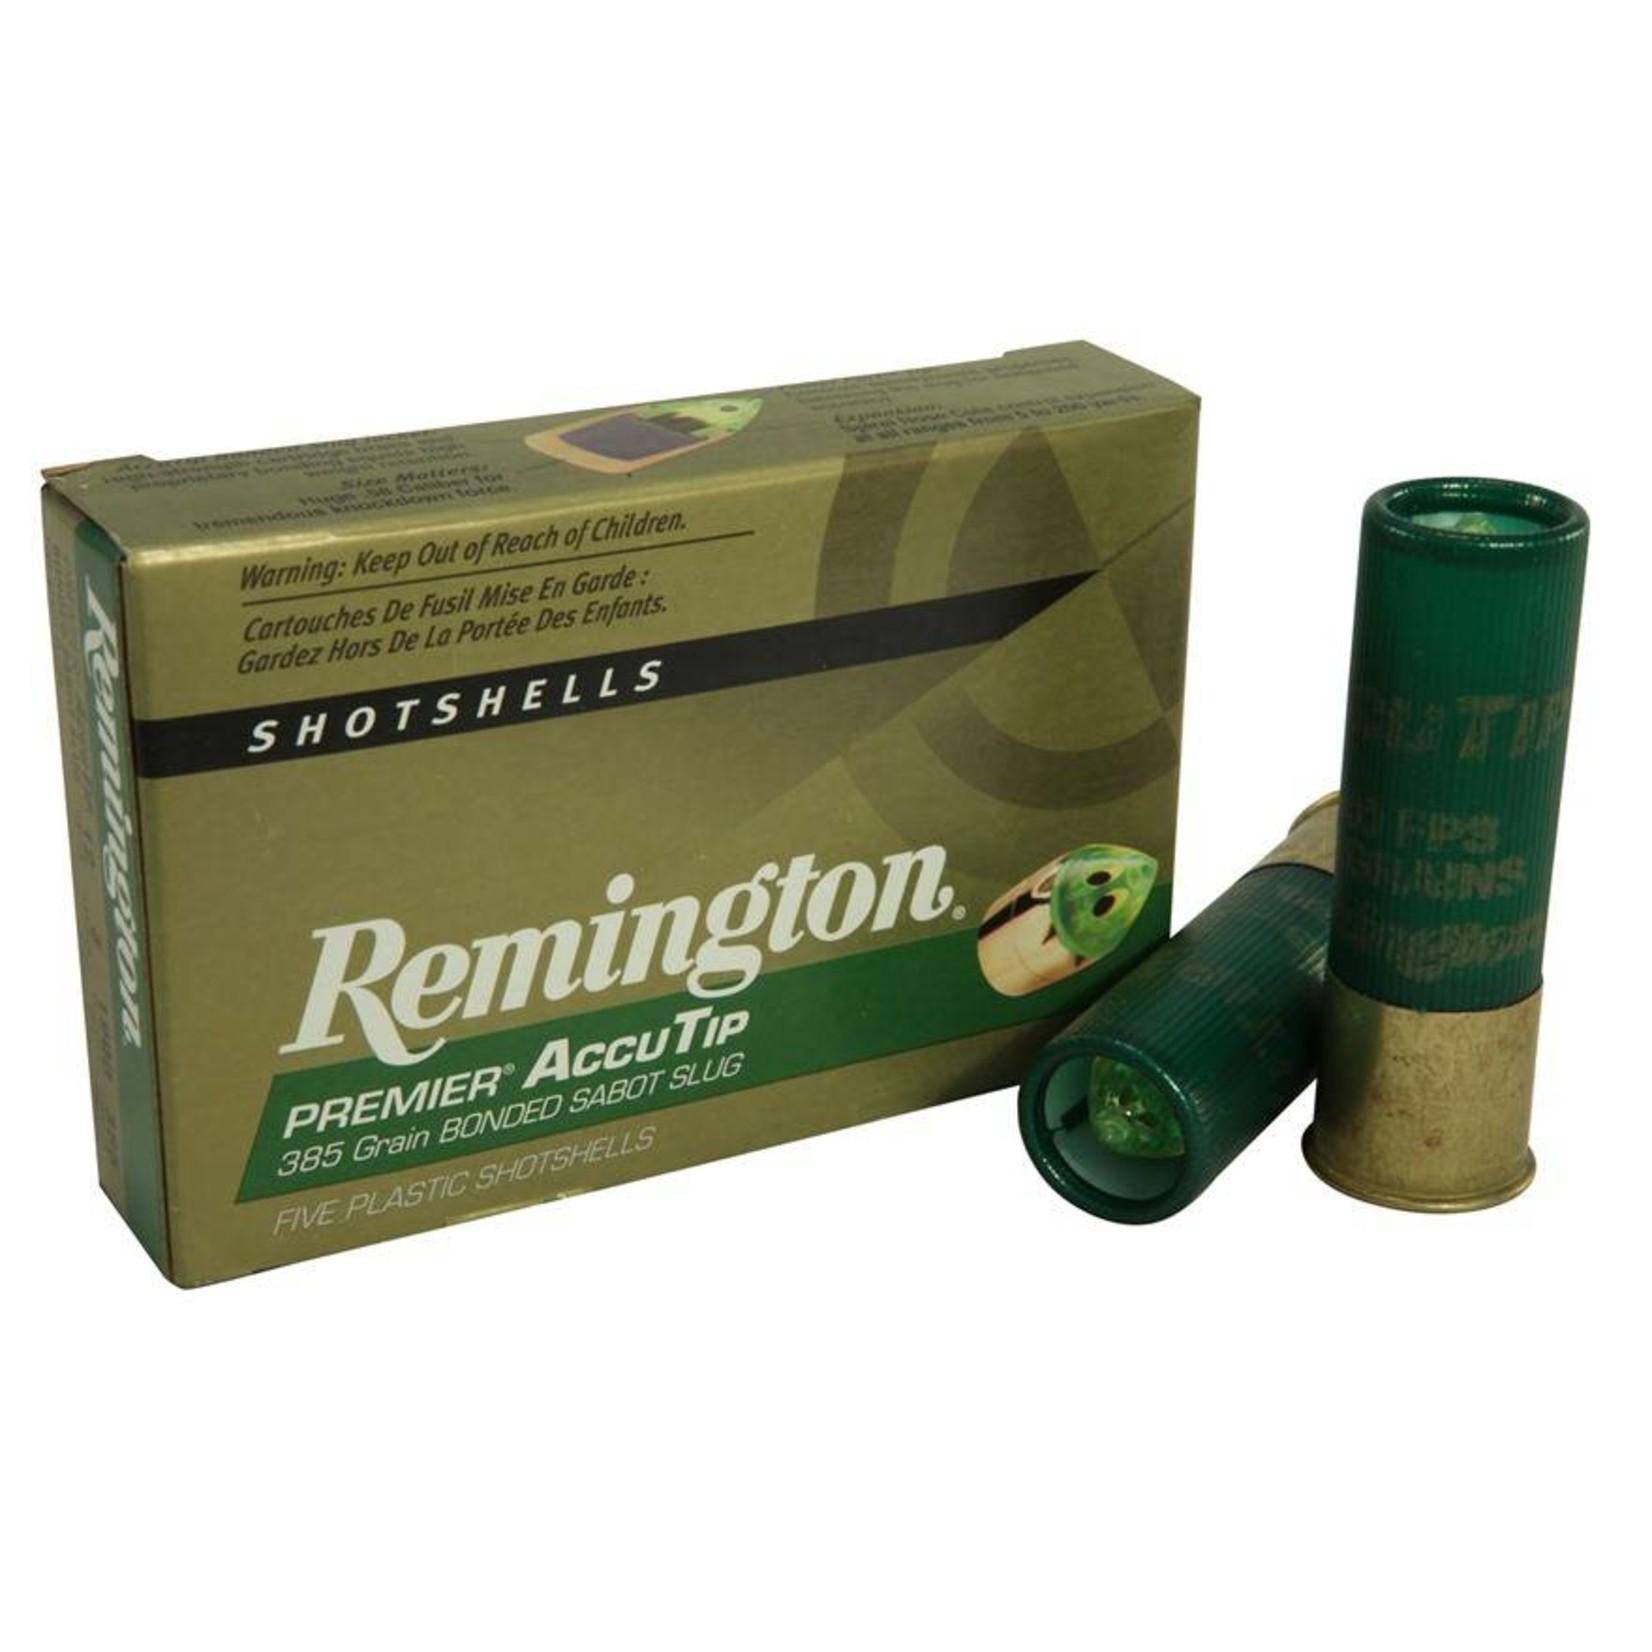 Remington Premier Accutip Bonded Sabot Slug Shotgun Shells 5 Rounds Triggers And Bows